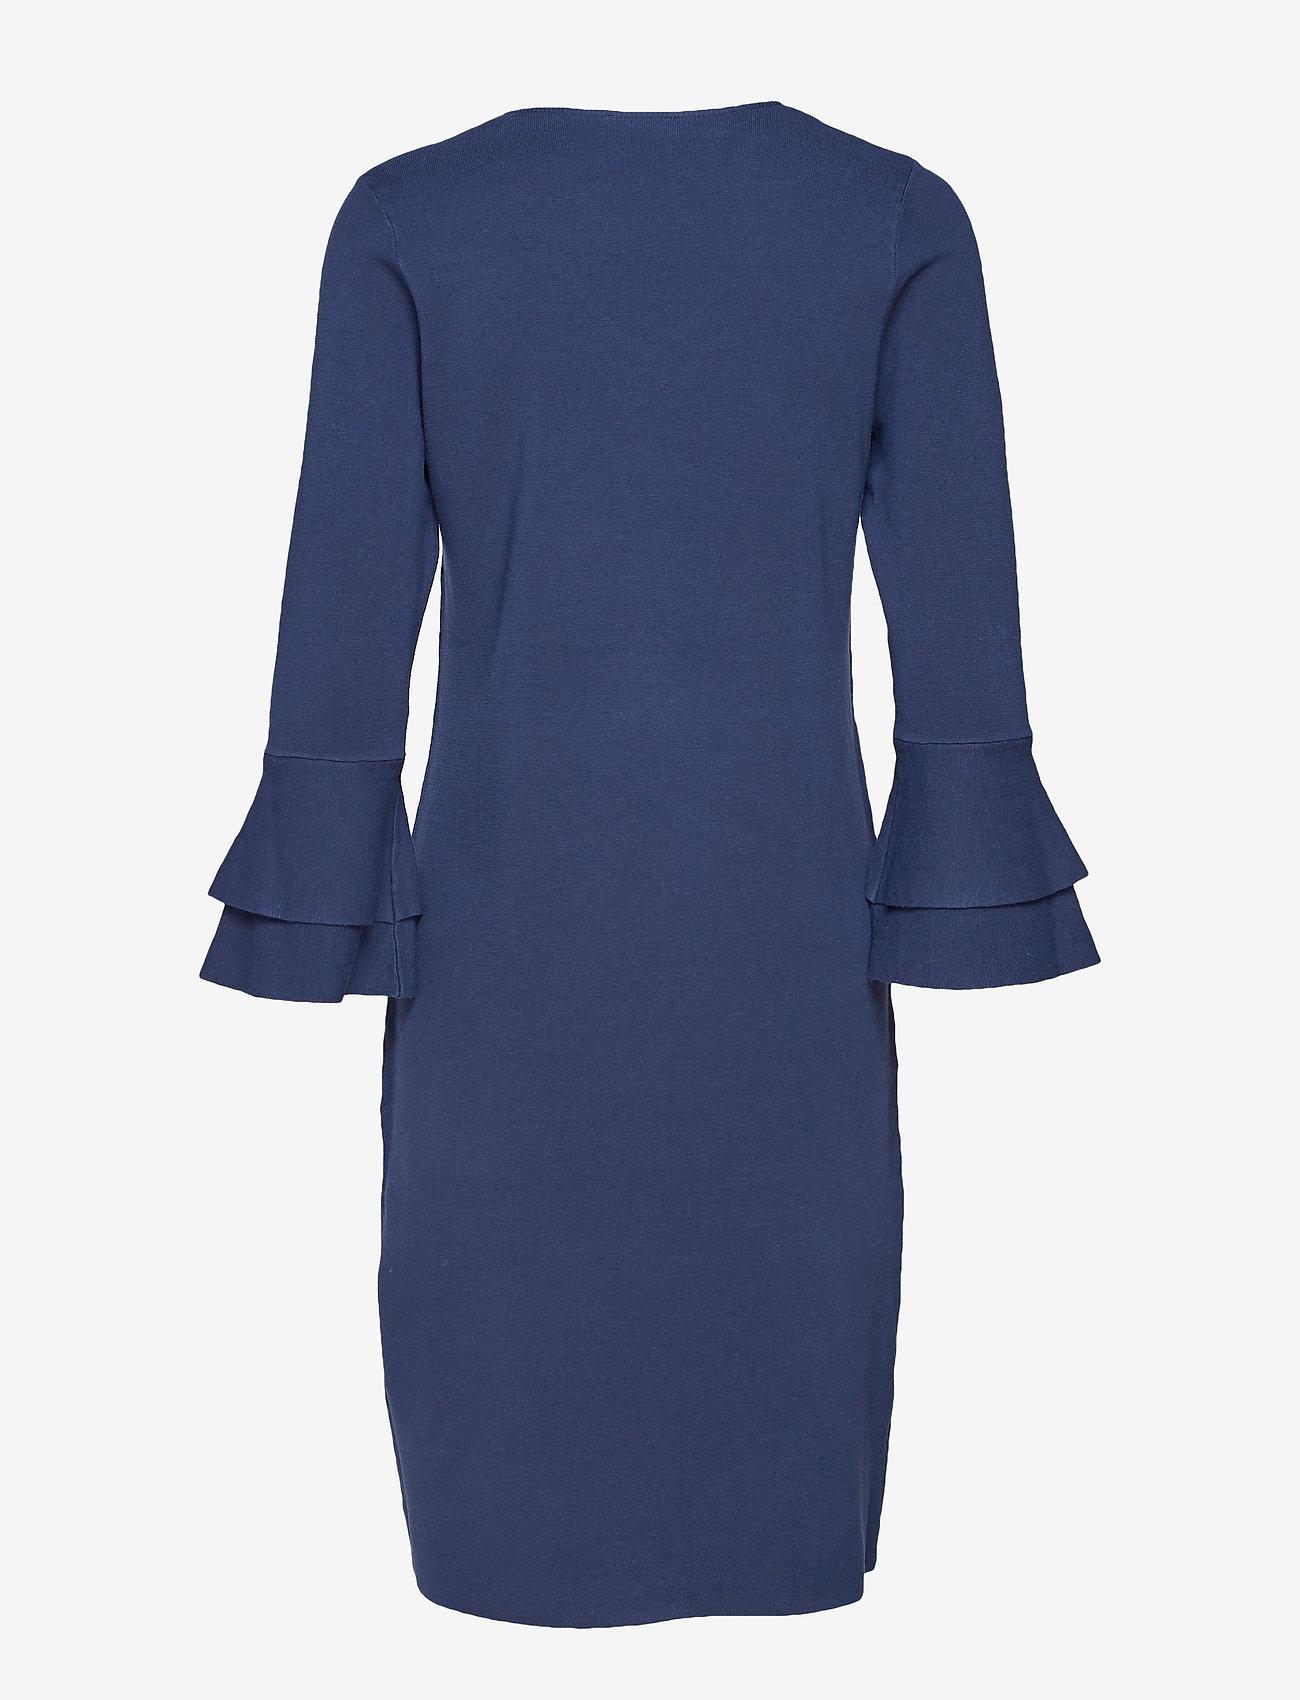 Taifun DRESS KNITWEAR - Kjoler PIGEON BLUE - Dameklær Spesialtilbud